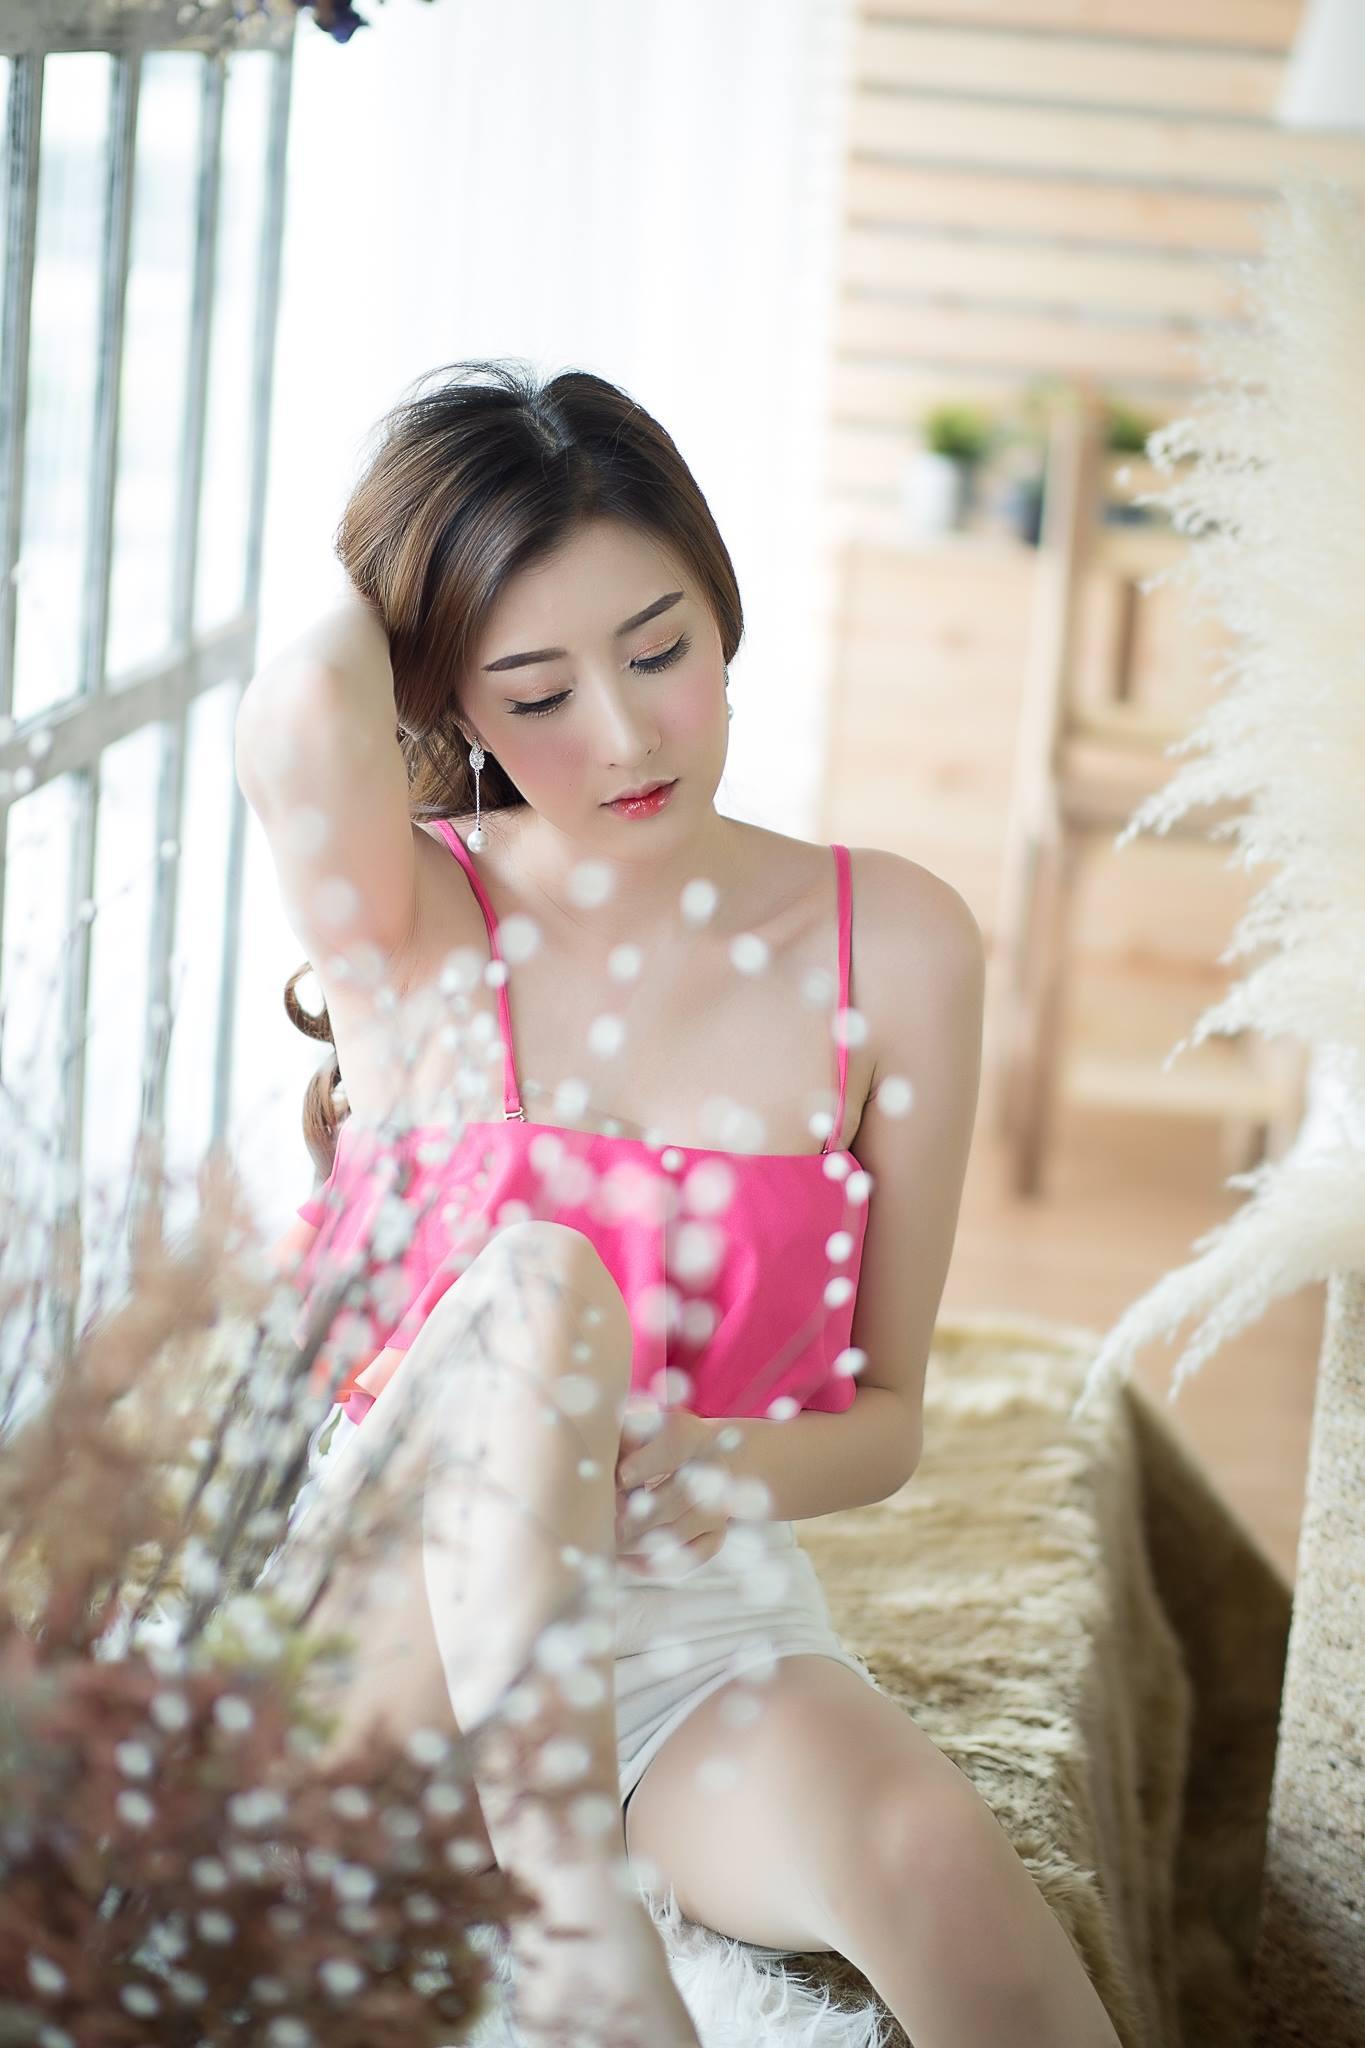 Pink Top - Nannapat Muayly Rungruangwong